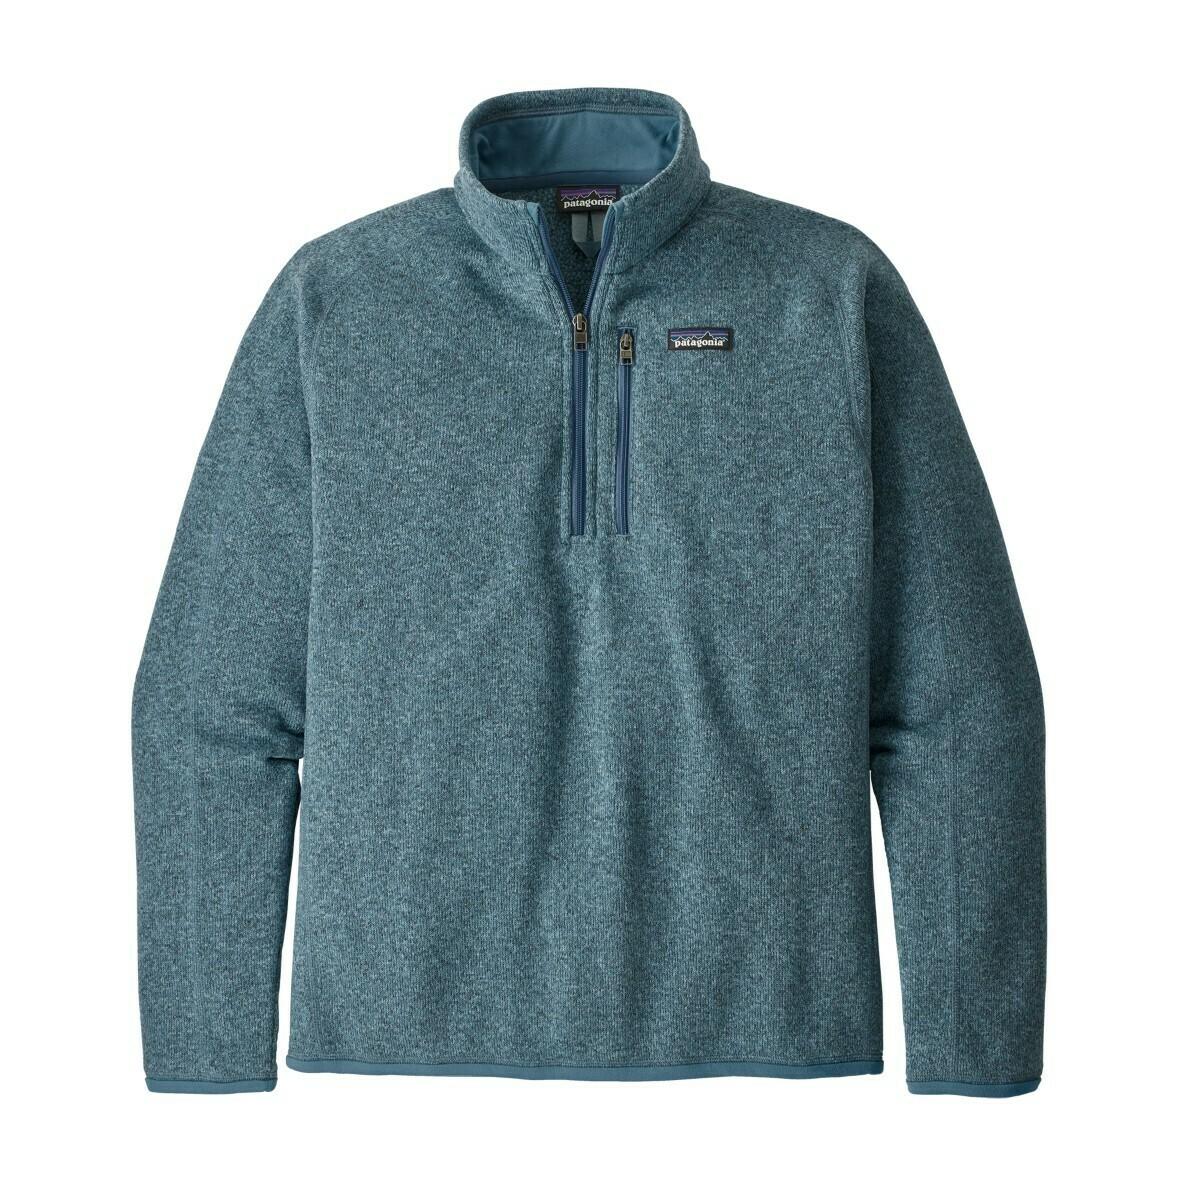 Patagonia Men's Better Sweater Quarter Zip